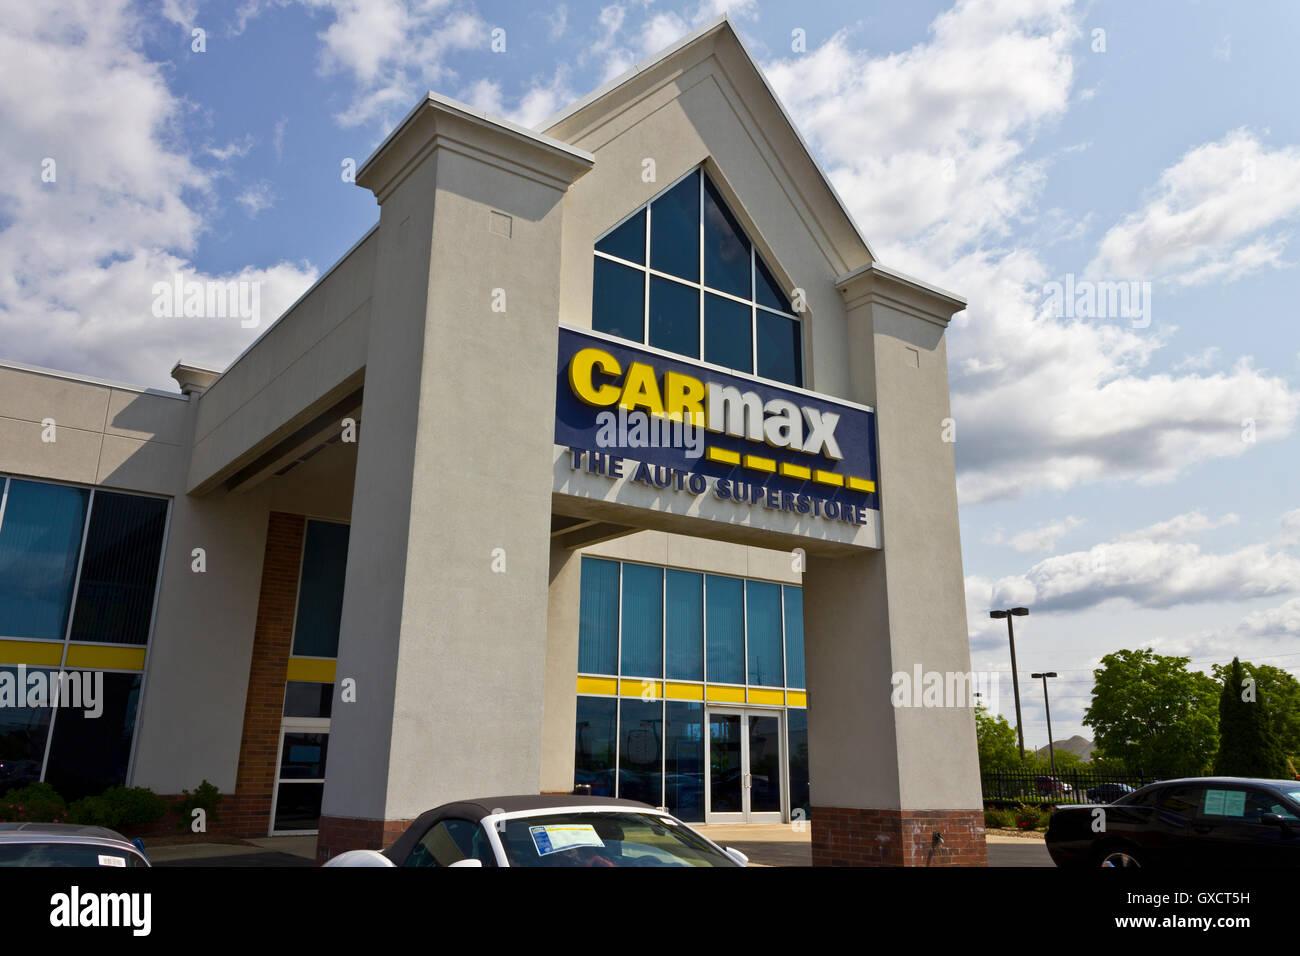 Carmax Stock Photos Carmax Stock Images Alamy